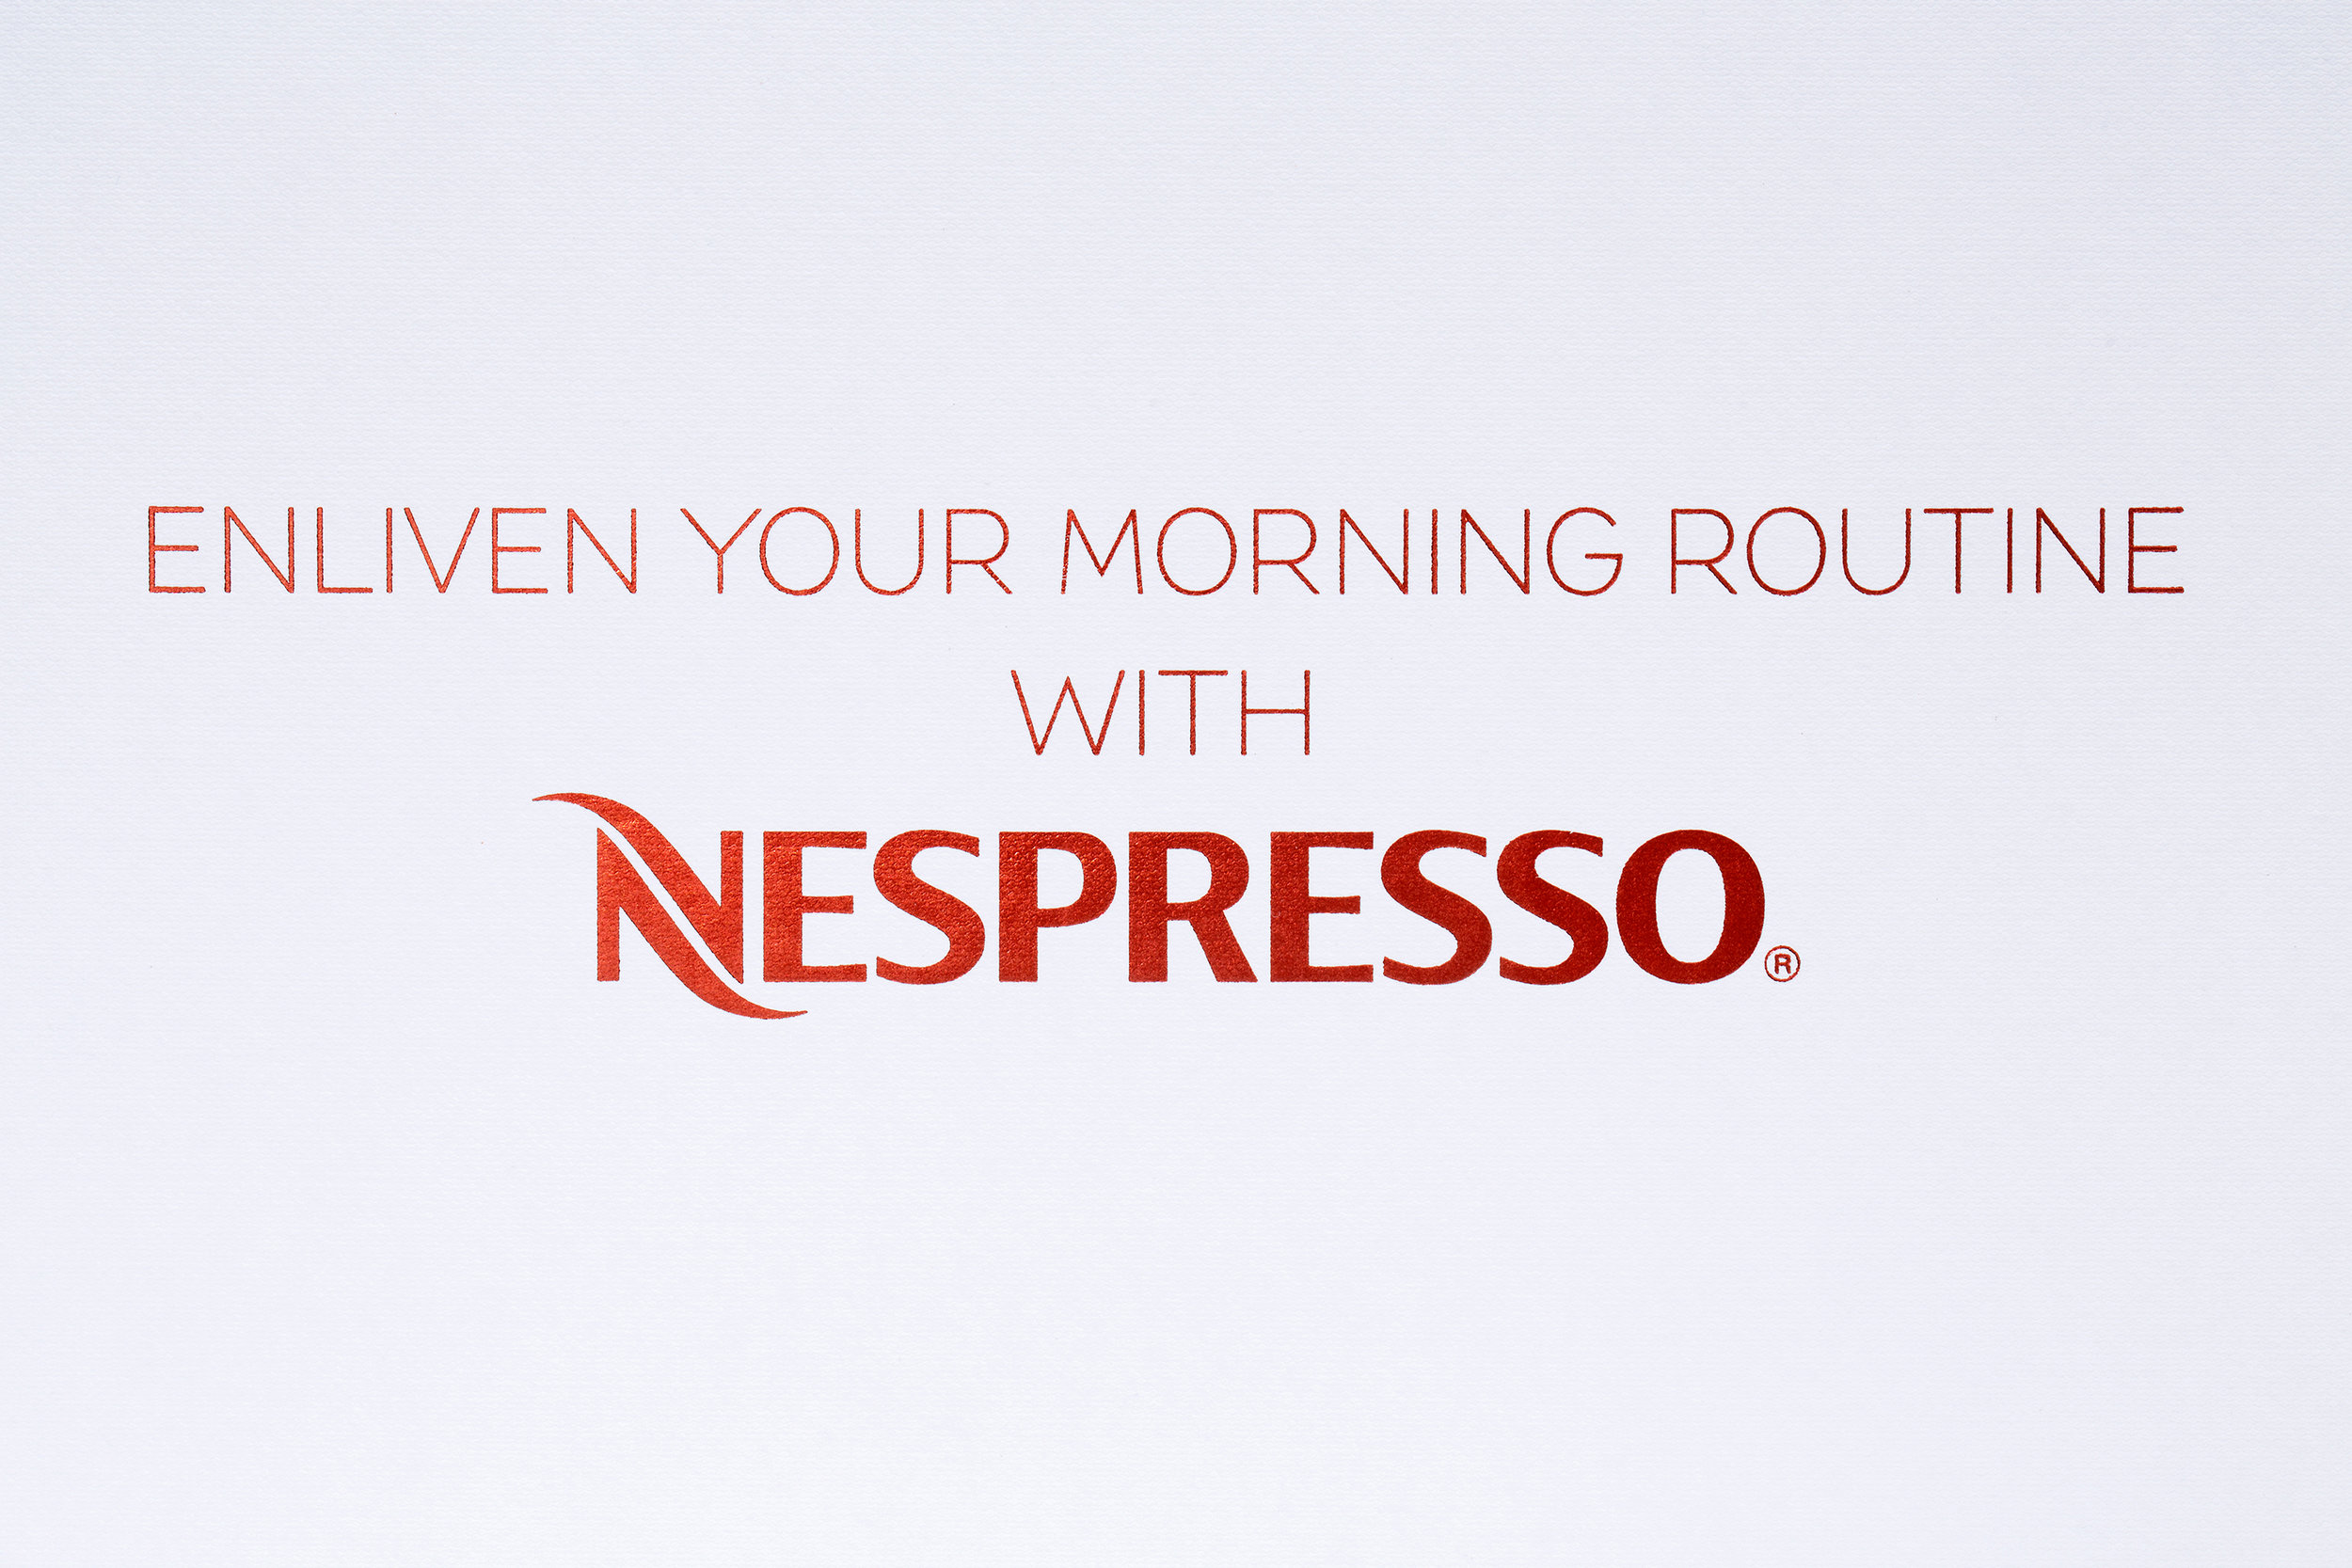 nespresso_envivo_1.jpg